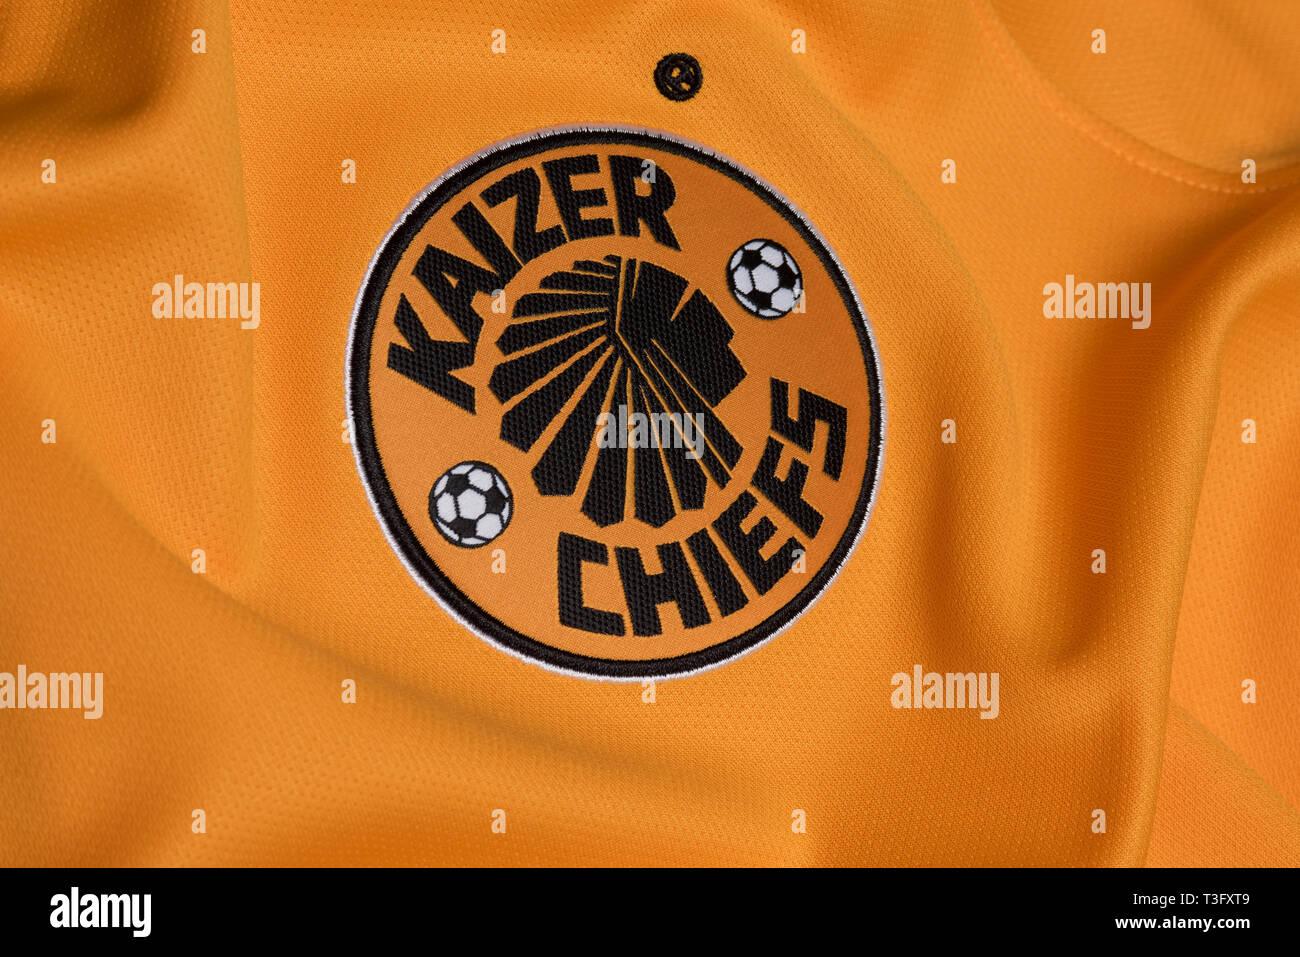 Close up of Kaizer Chiefs jersey. - Stock Image